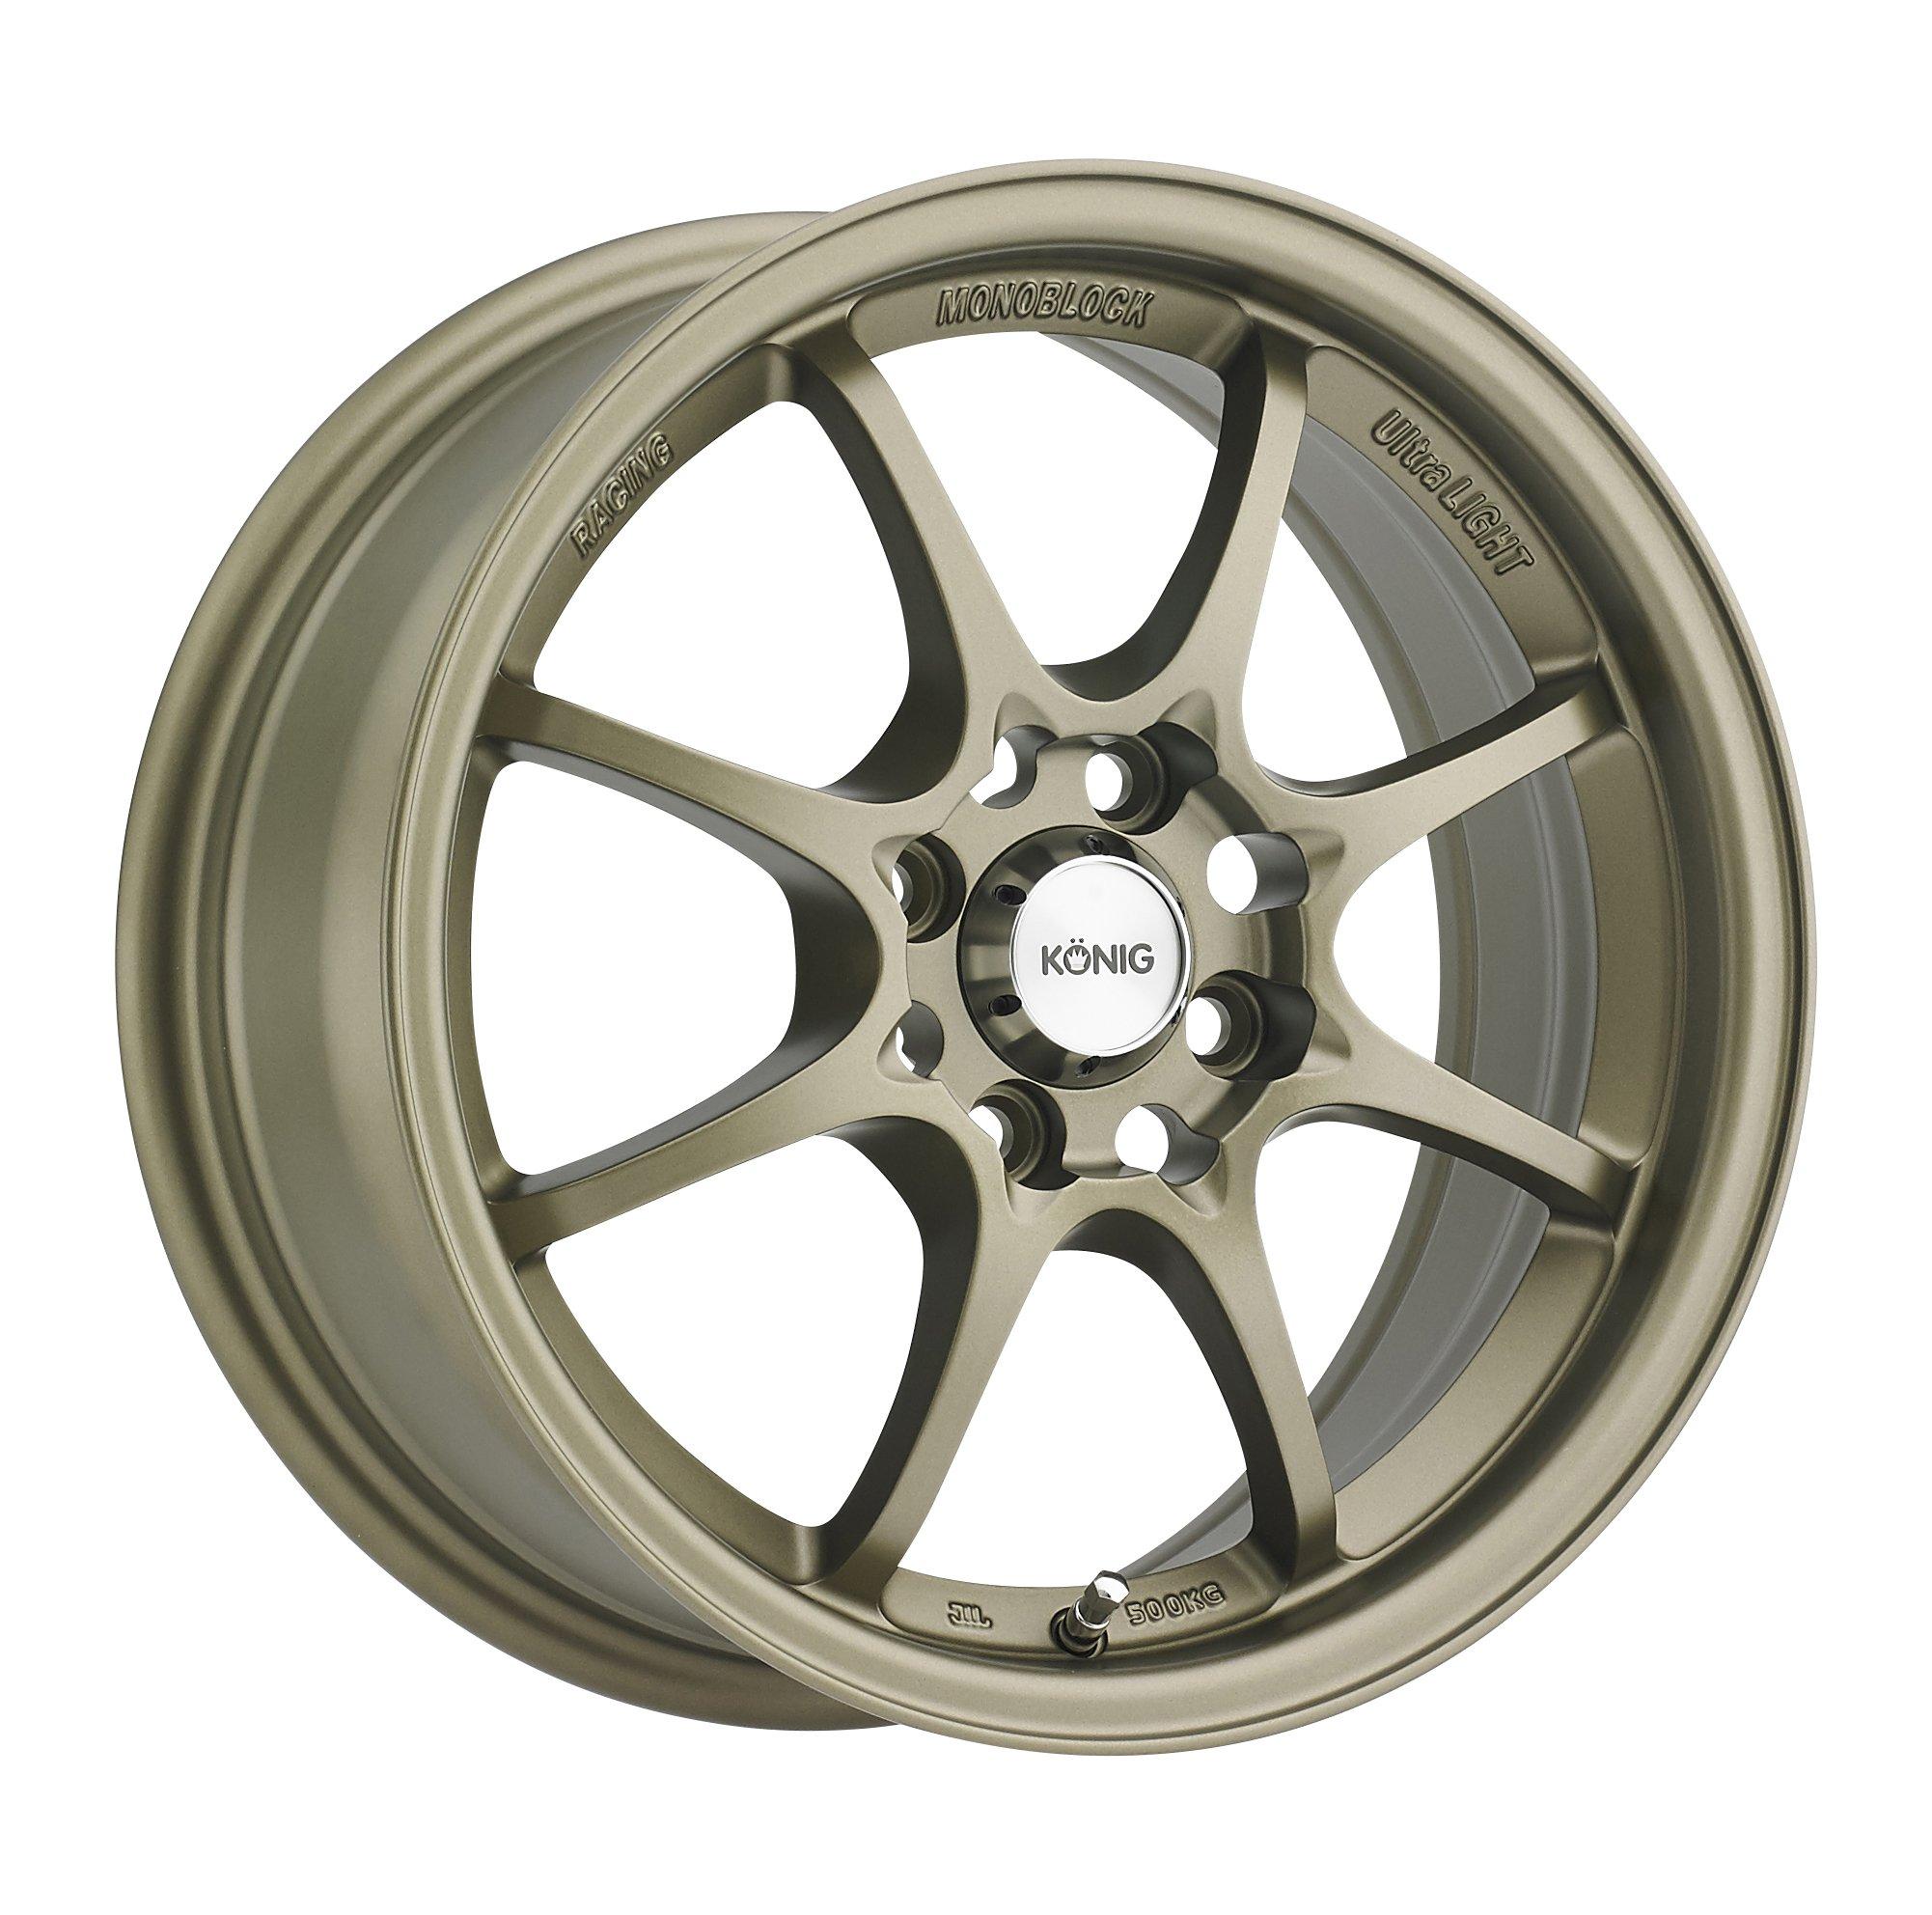 Konig-Helium-Bronze-Wheel-15x654x100mm